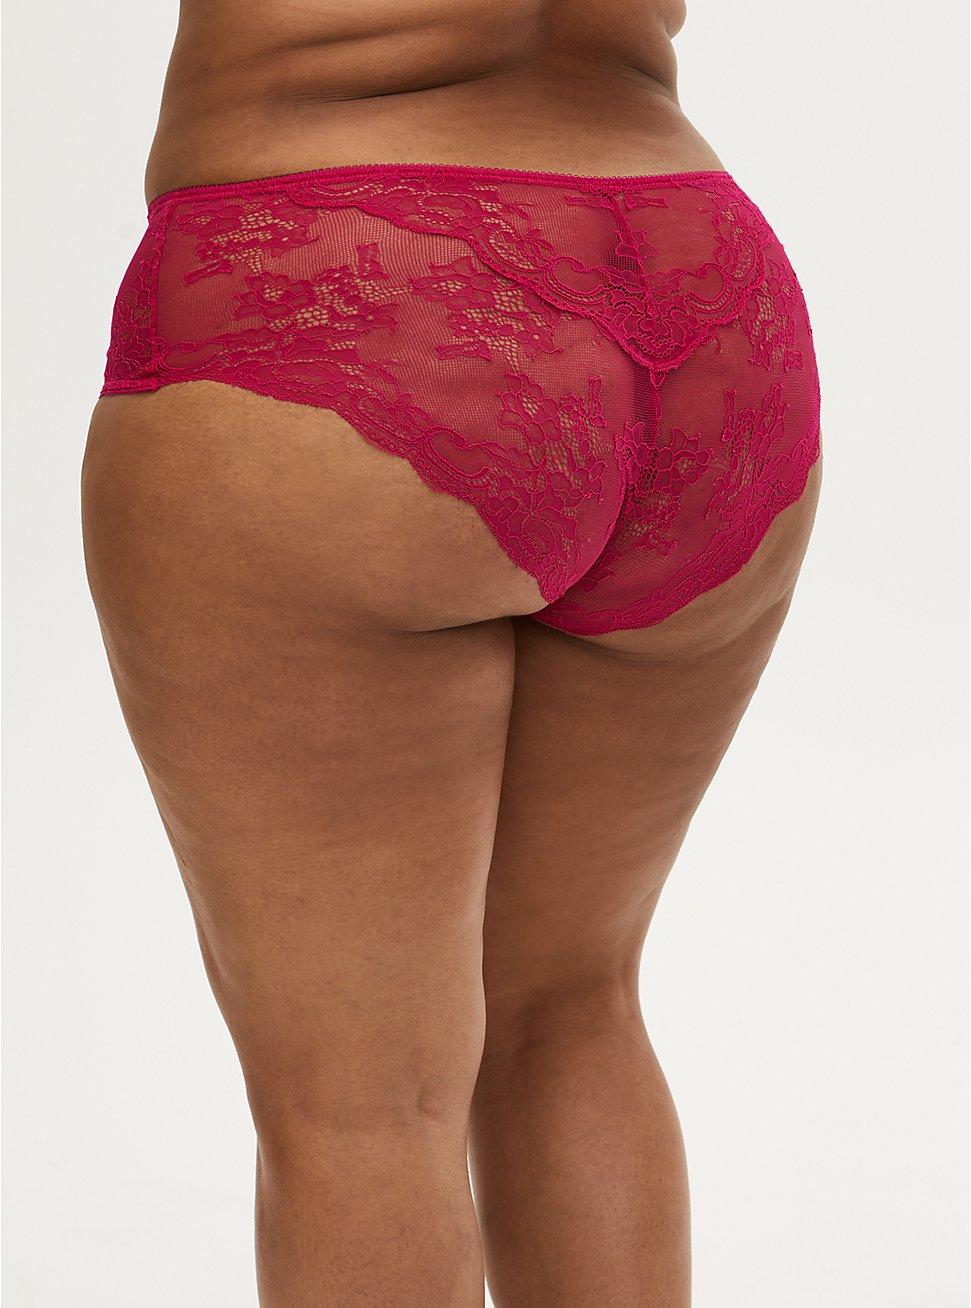 Raspberry Pink Microfiber & Lace back Hipster Panty , STRAWBERRY DAQUIRI, hi-res